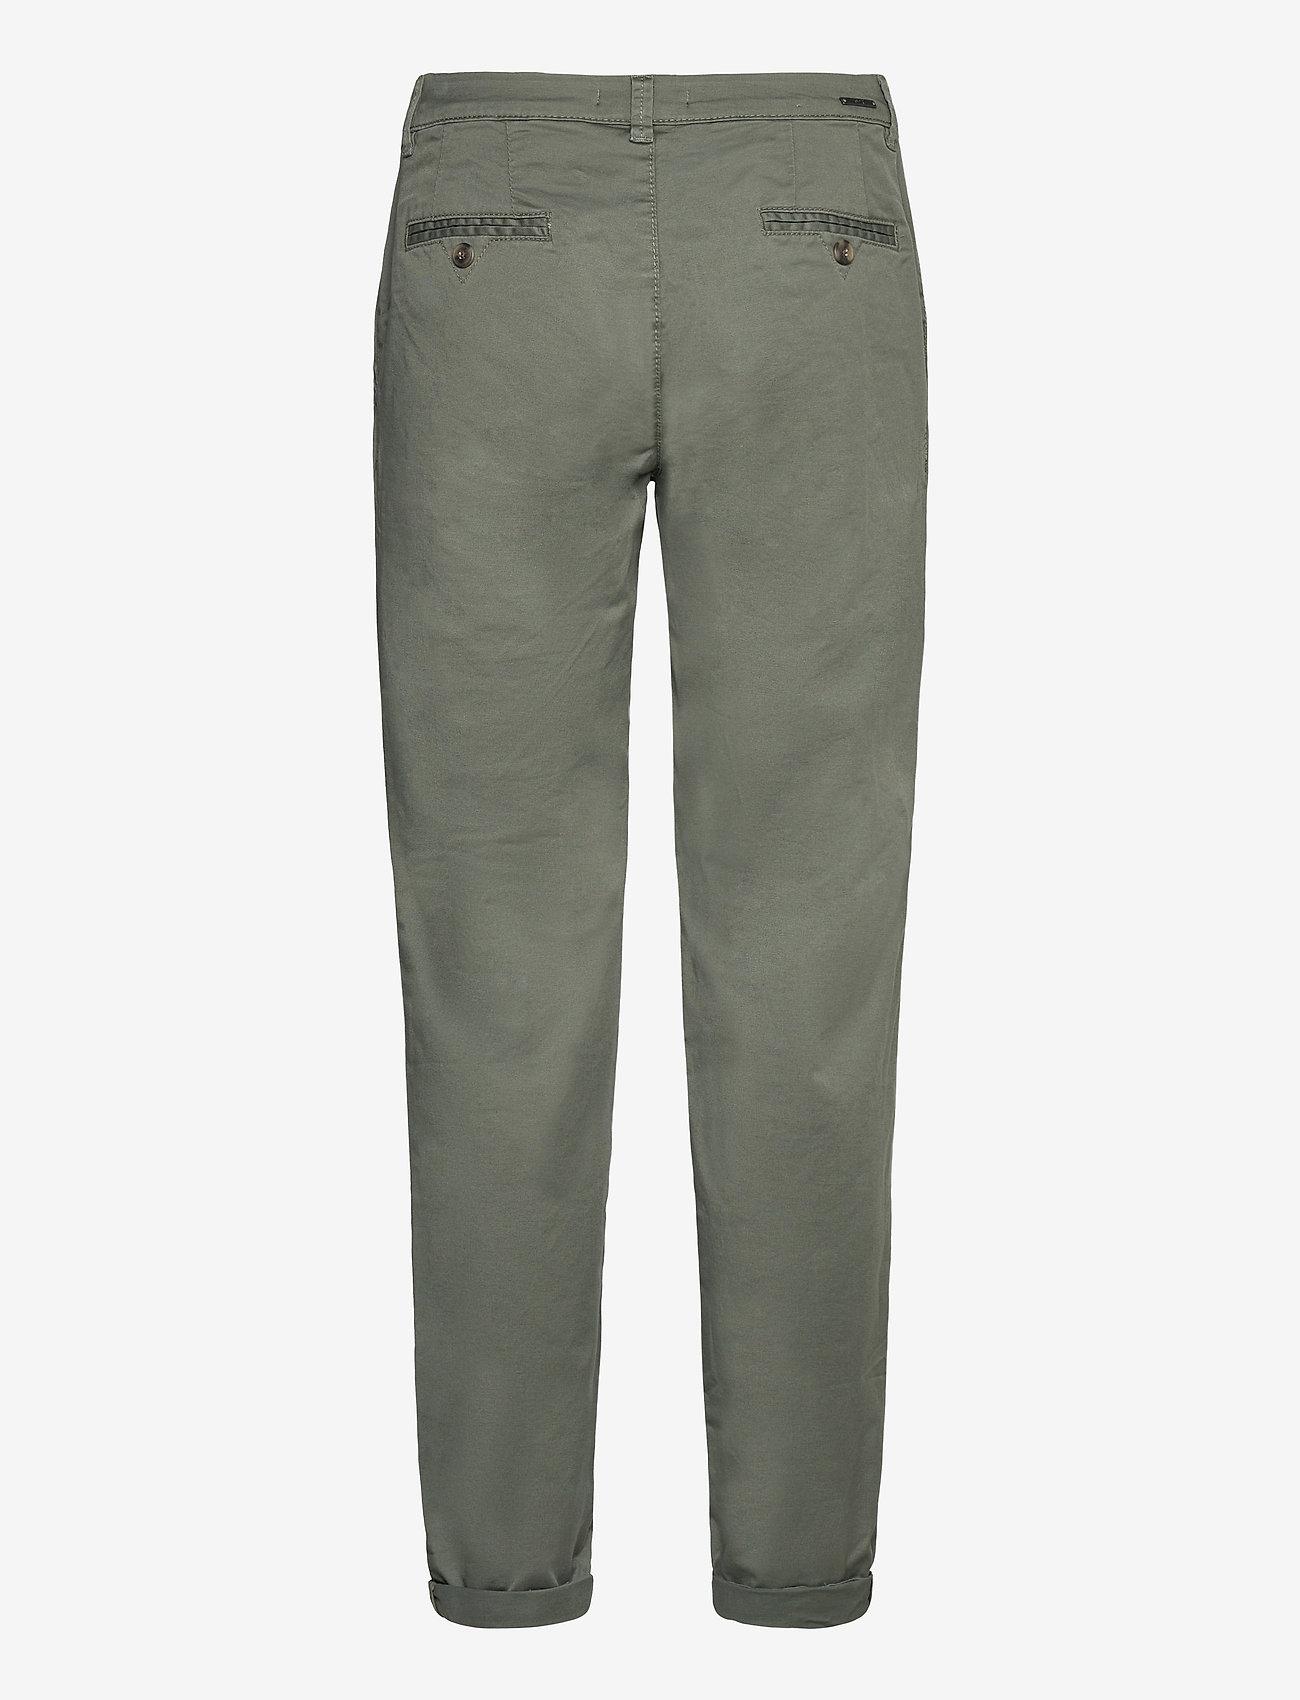 Esprit Casual - Pants woven - chinos - khaki green - 1